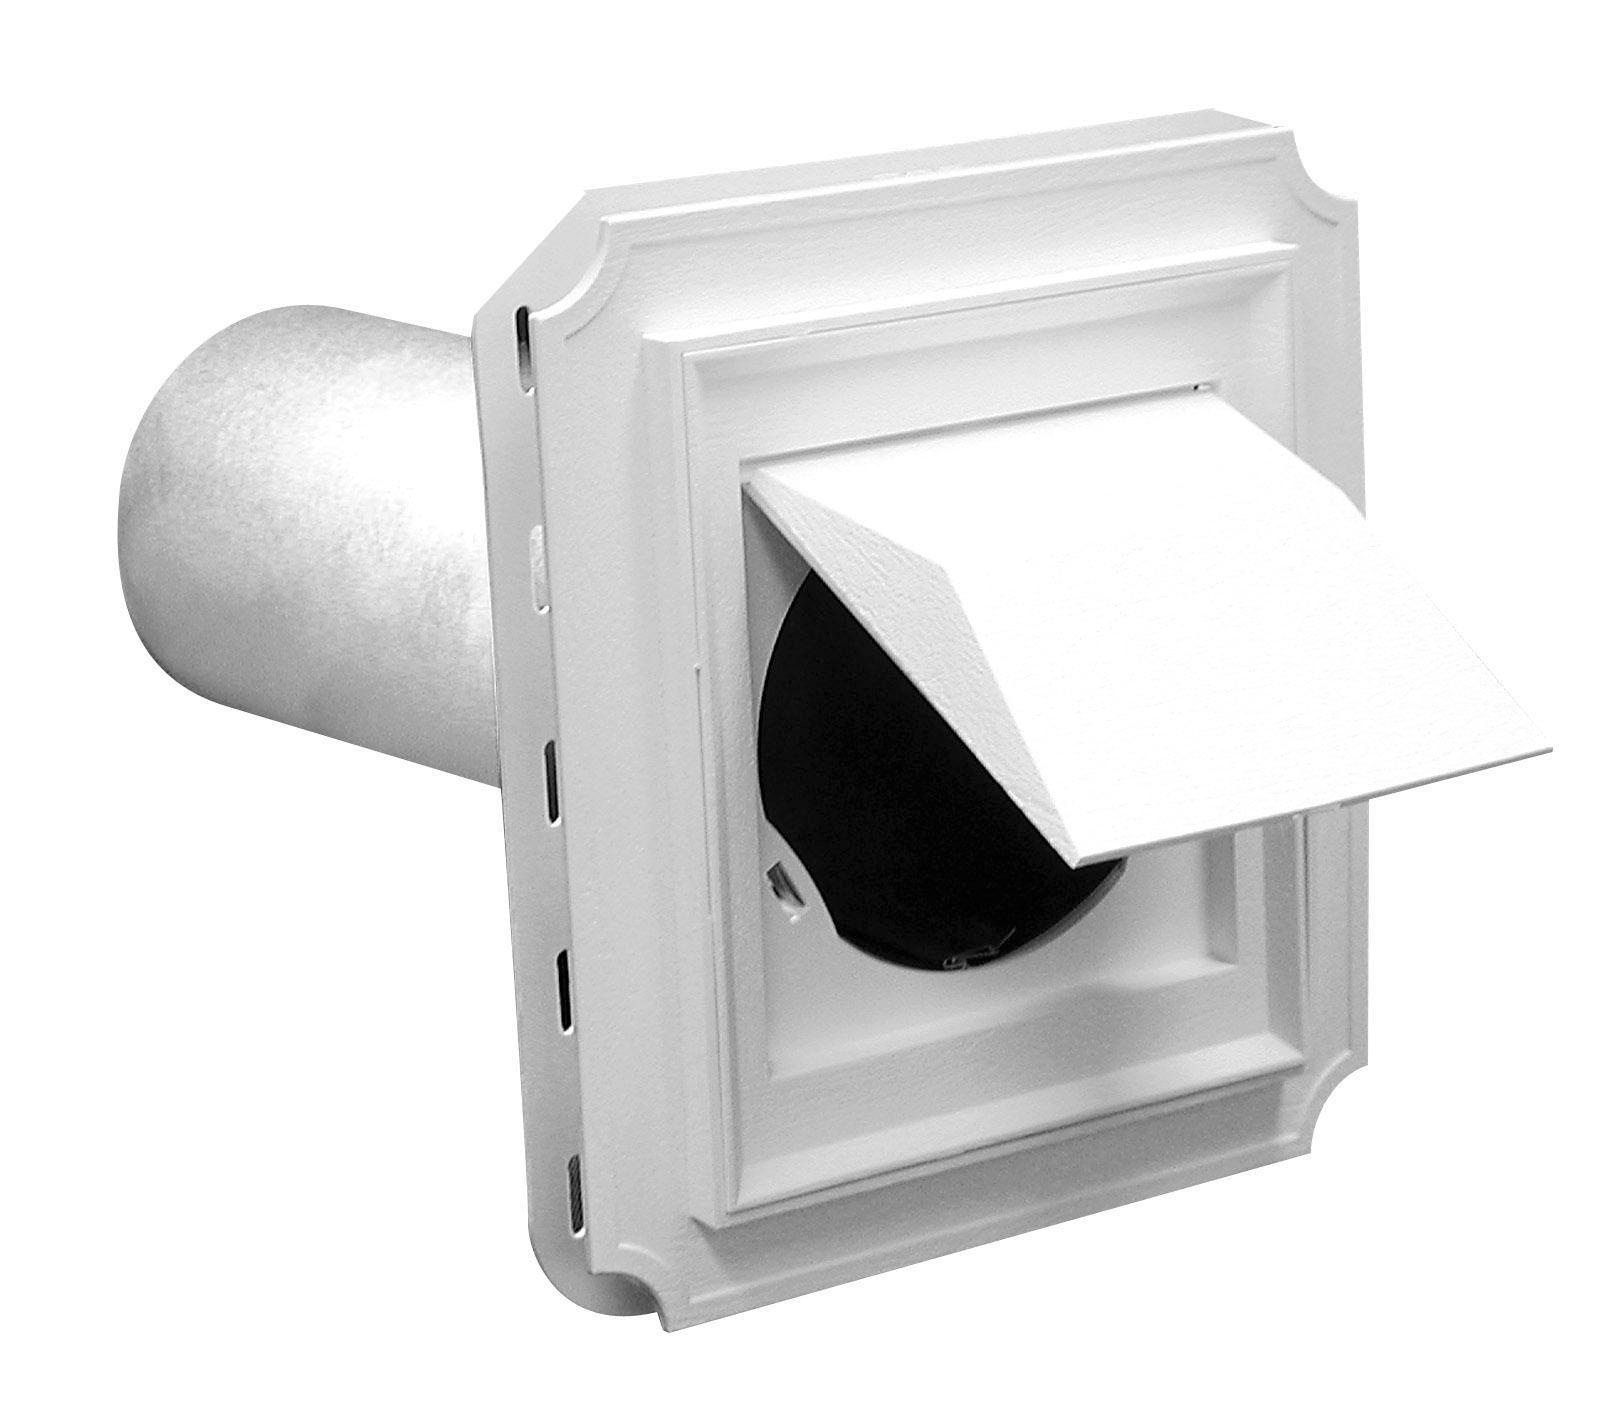 6-Inch Duraflo 646010-00 Wall Vent White